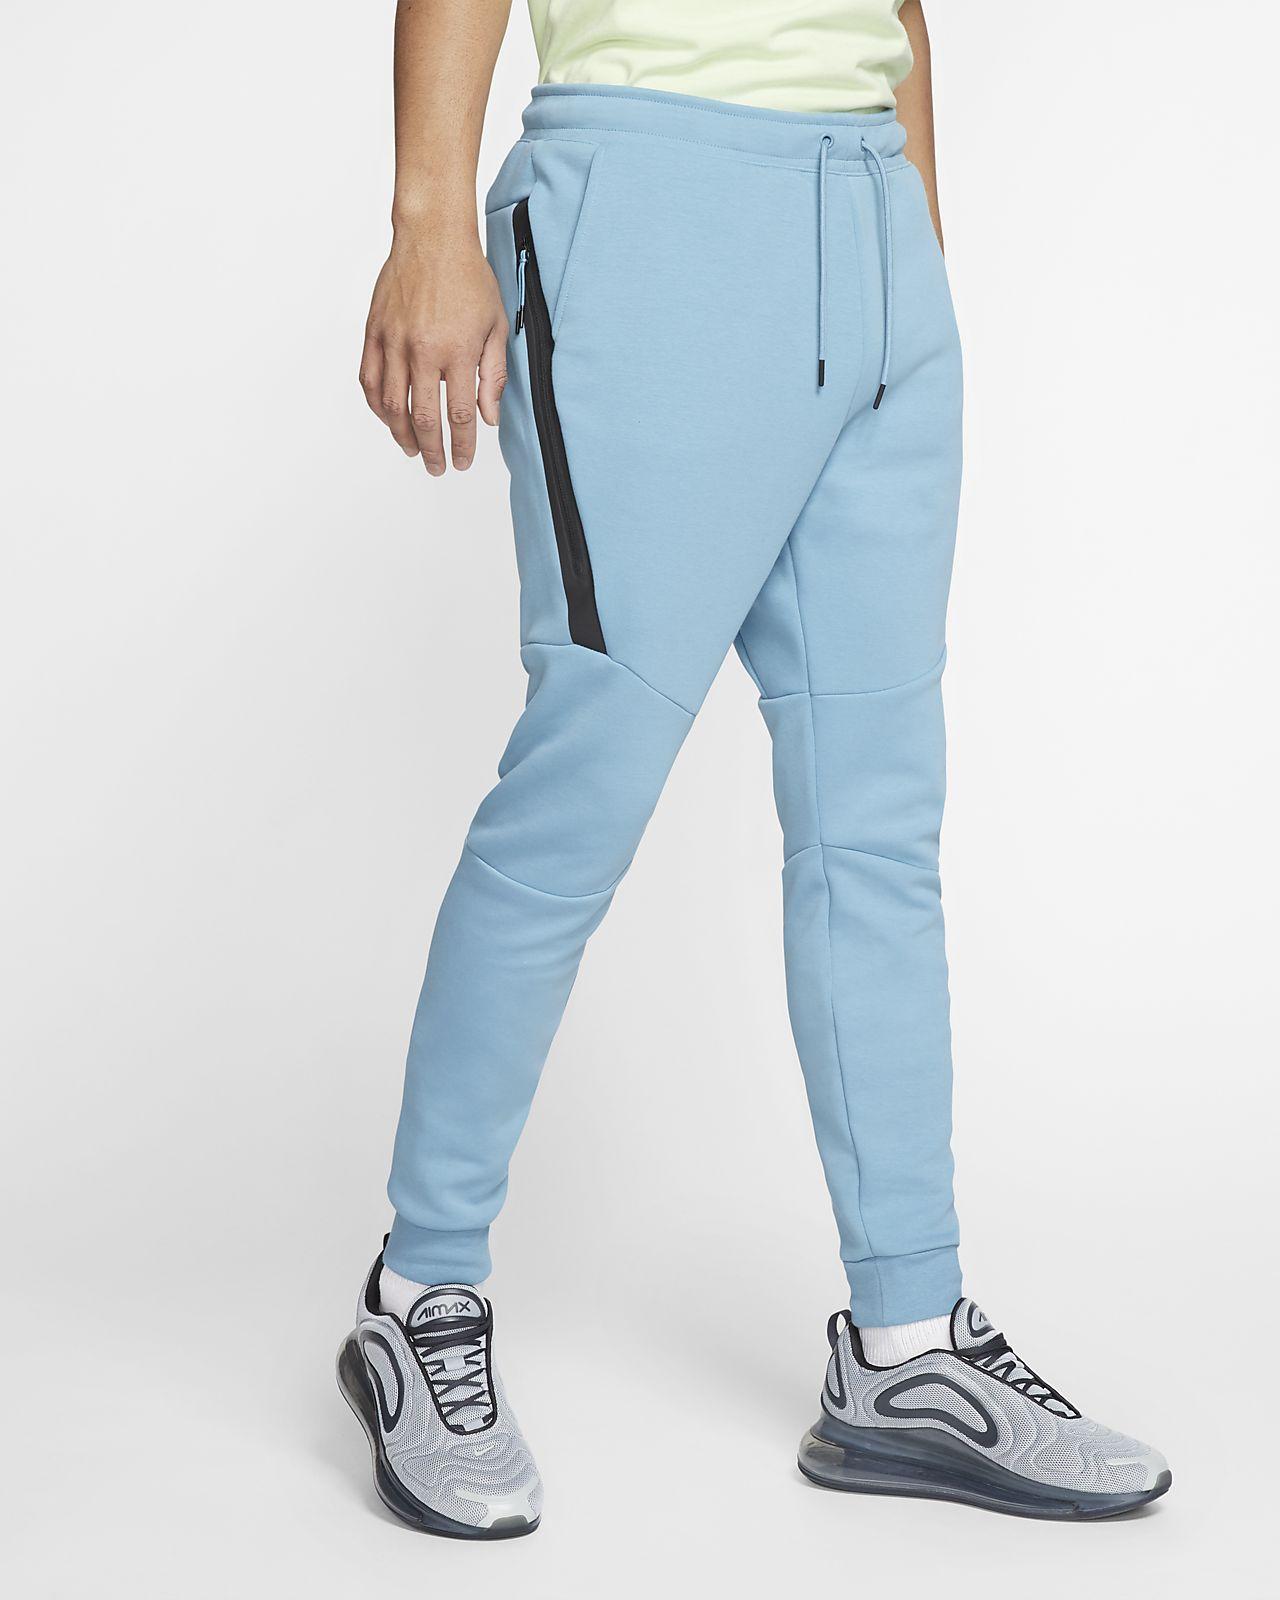 Nike Men/'s Tech Pack Fleece Top Casual Training Gym Sweatshirt SAMPLE Medium